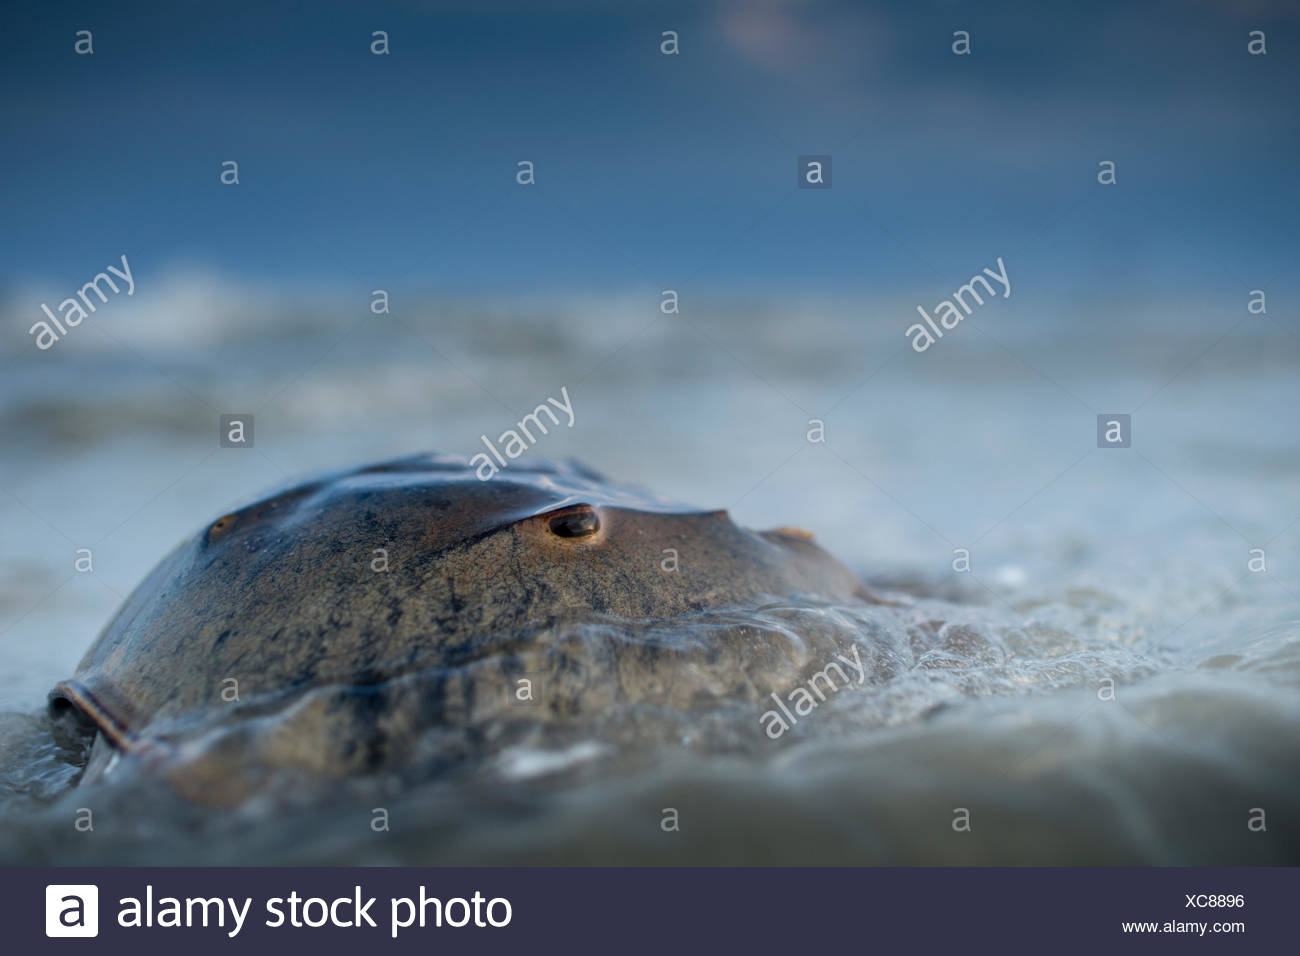 A horseshoe crab spawning near Harbor Island by full moon. - Stock Image